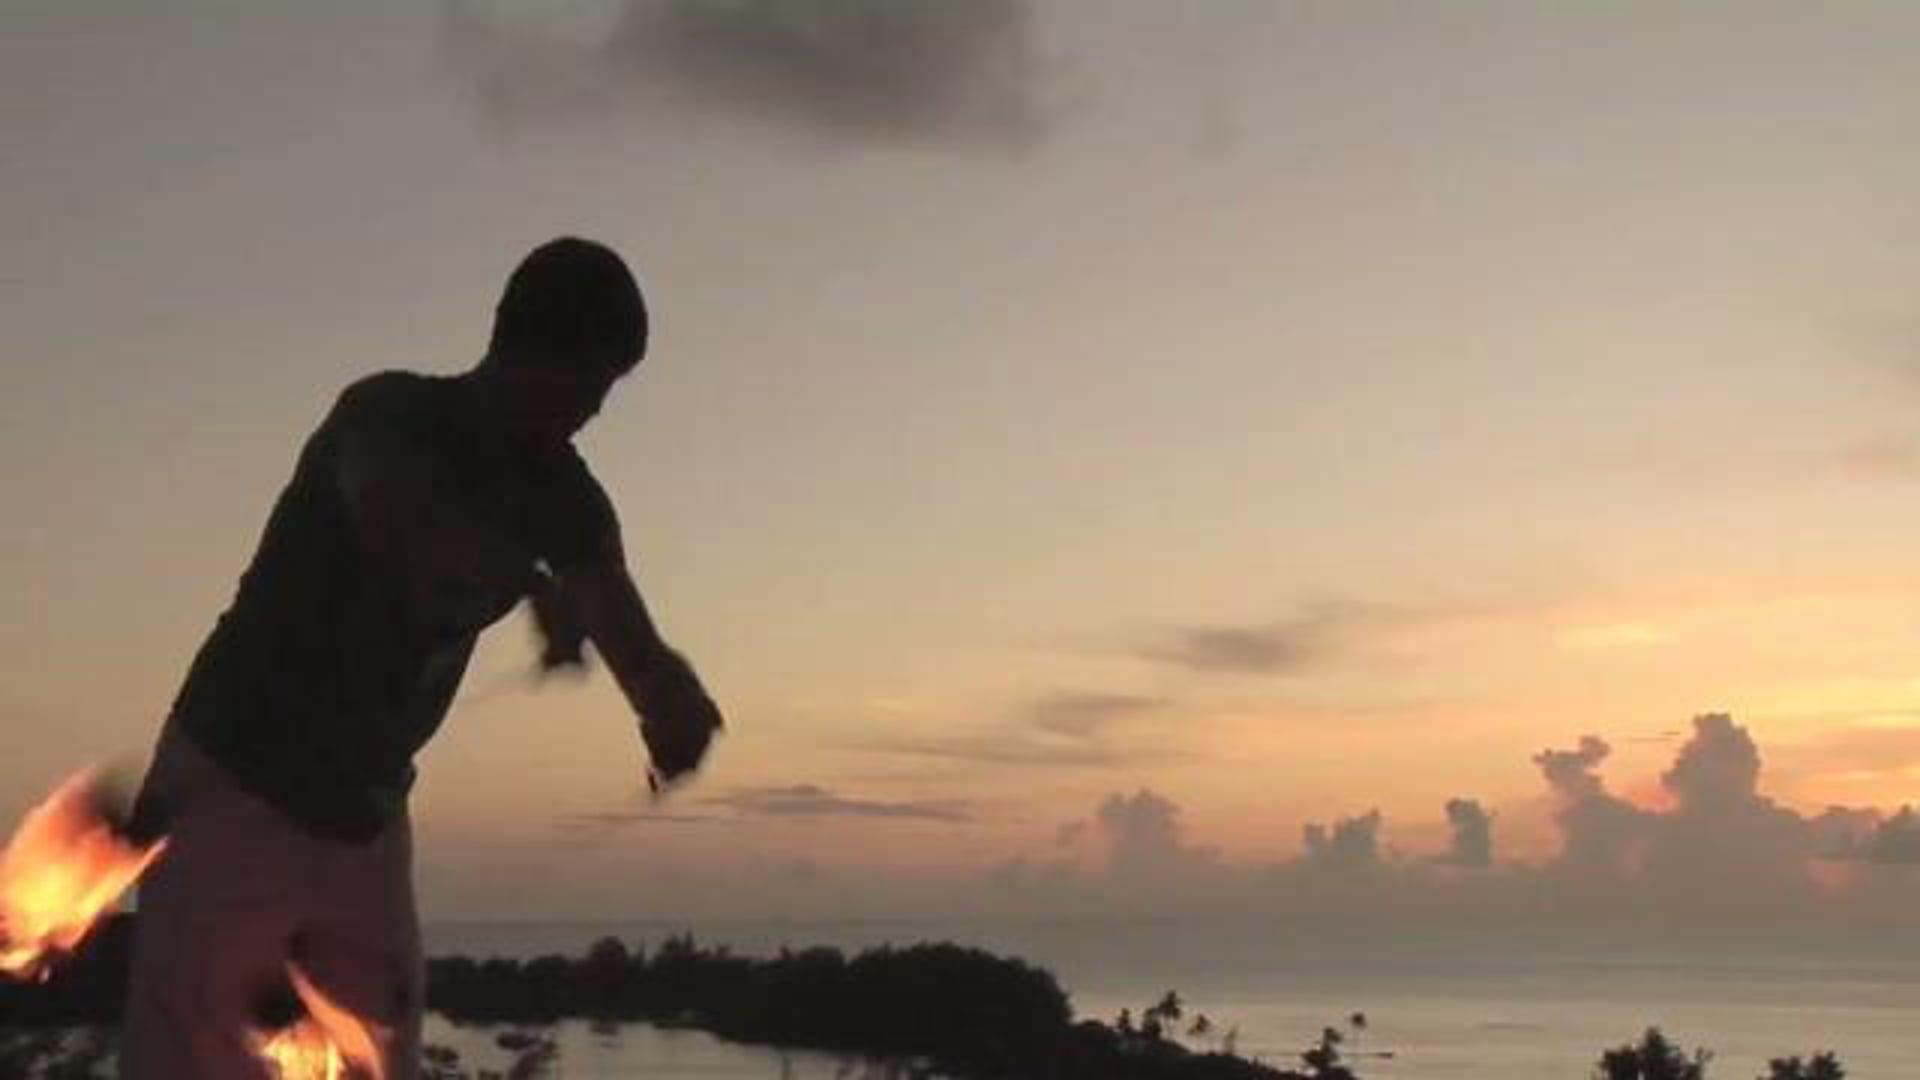 RockFire Bermuda 2009 Teaser Video